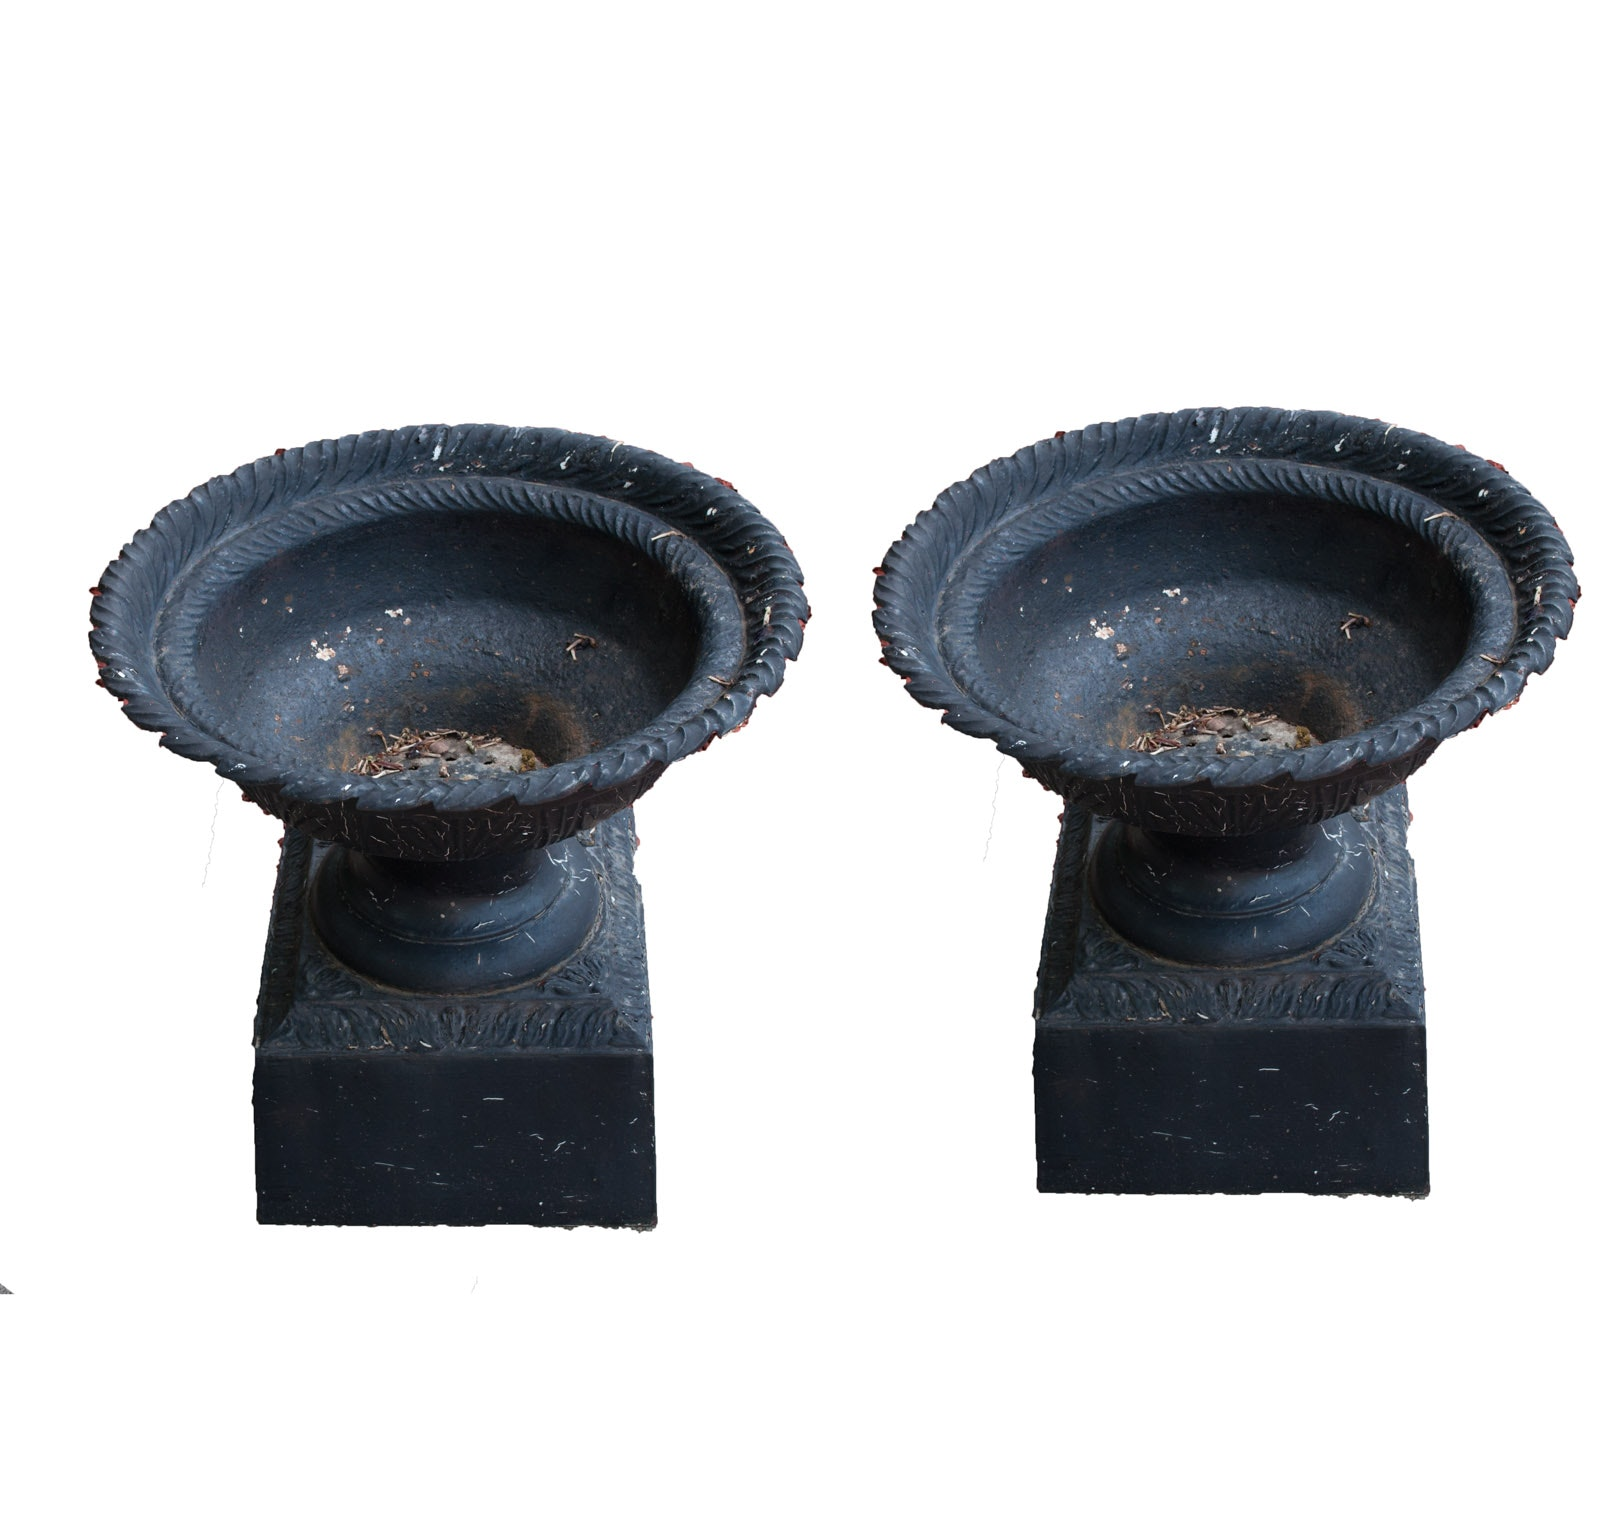 Outdoor Cast Iron Urns